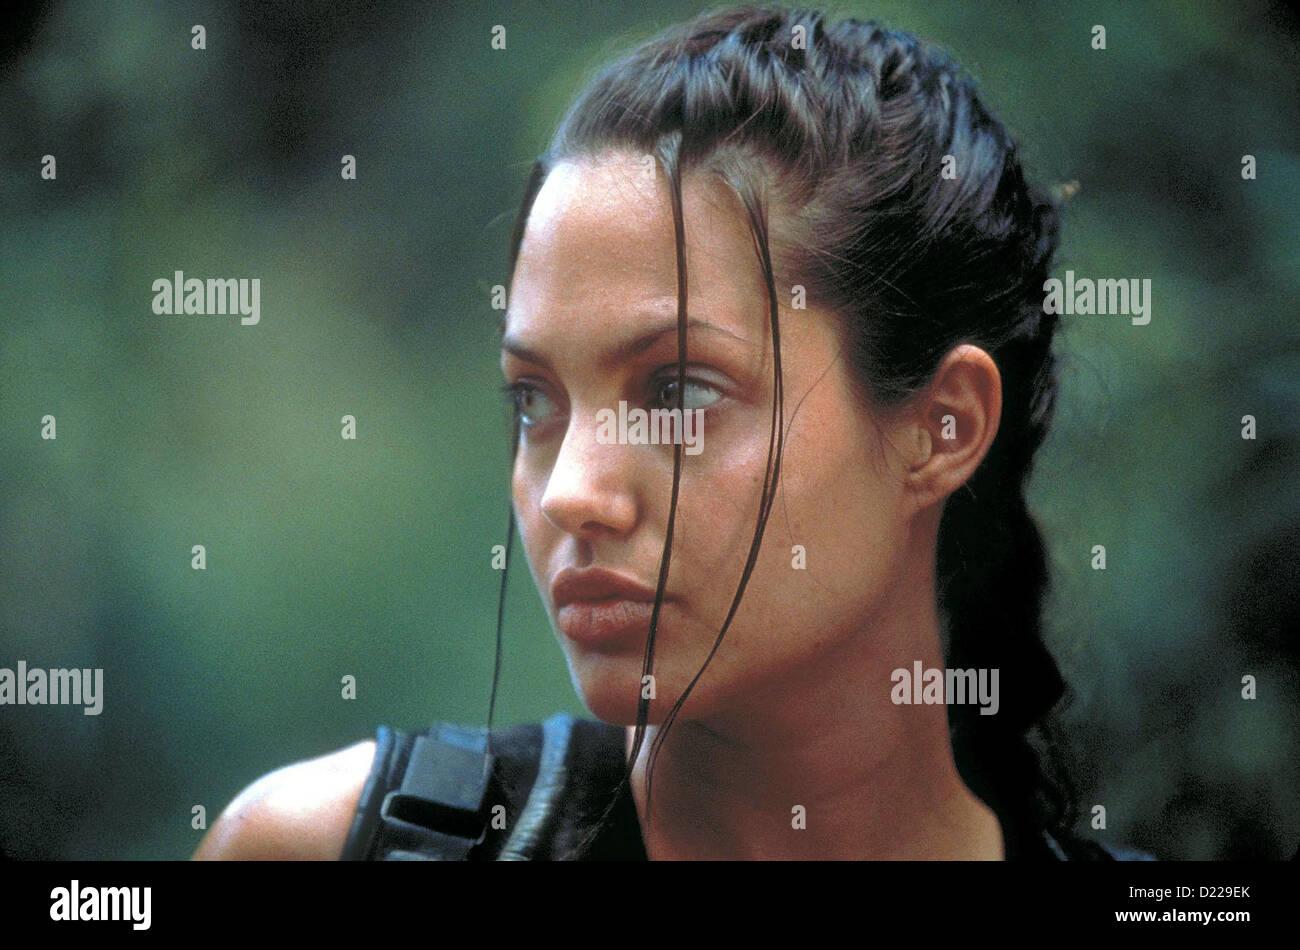 Lara Croft: Tomb Raider   Lara Croft: Tomb Raider   Lara Croft (Angelina Jolie) *** Local Caption *** 2001  Concorde - Stock Image